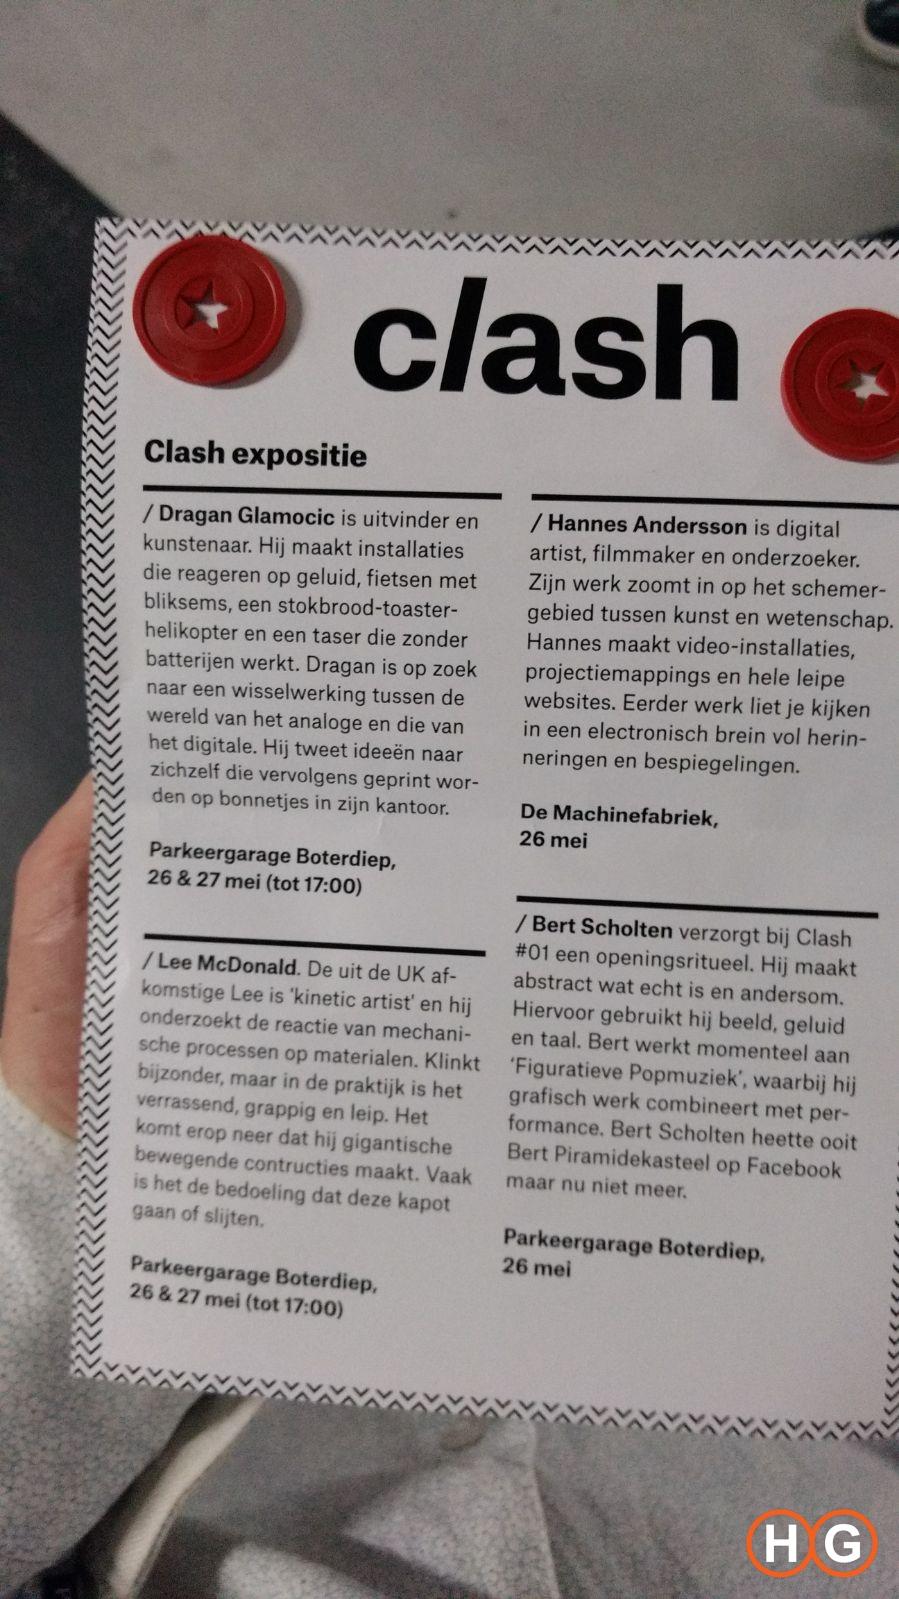 Clash expositie